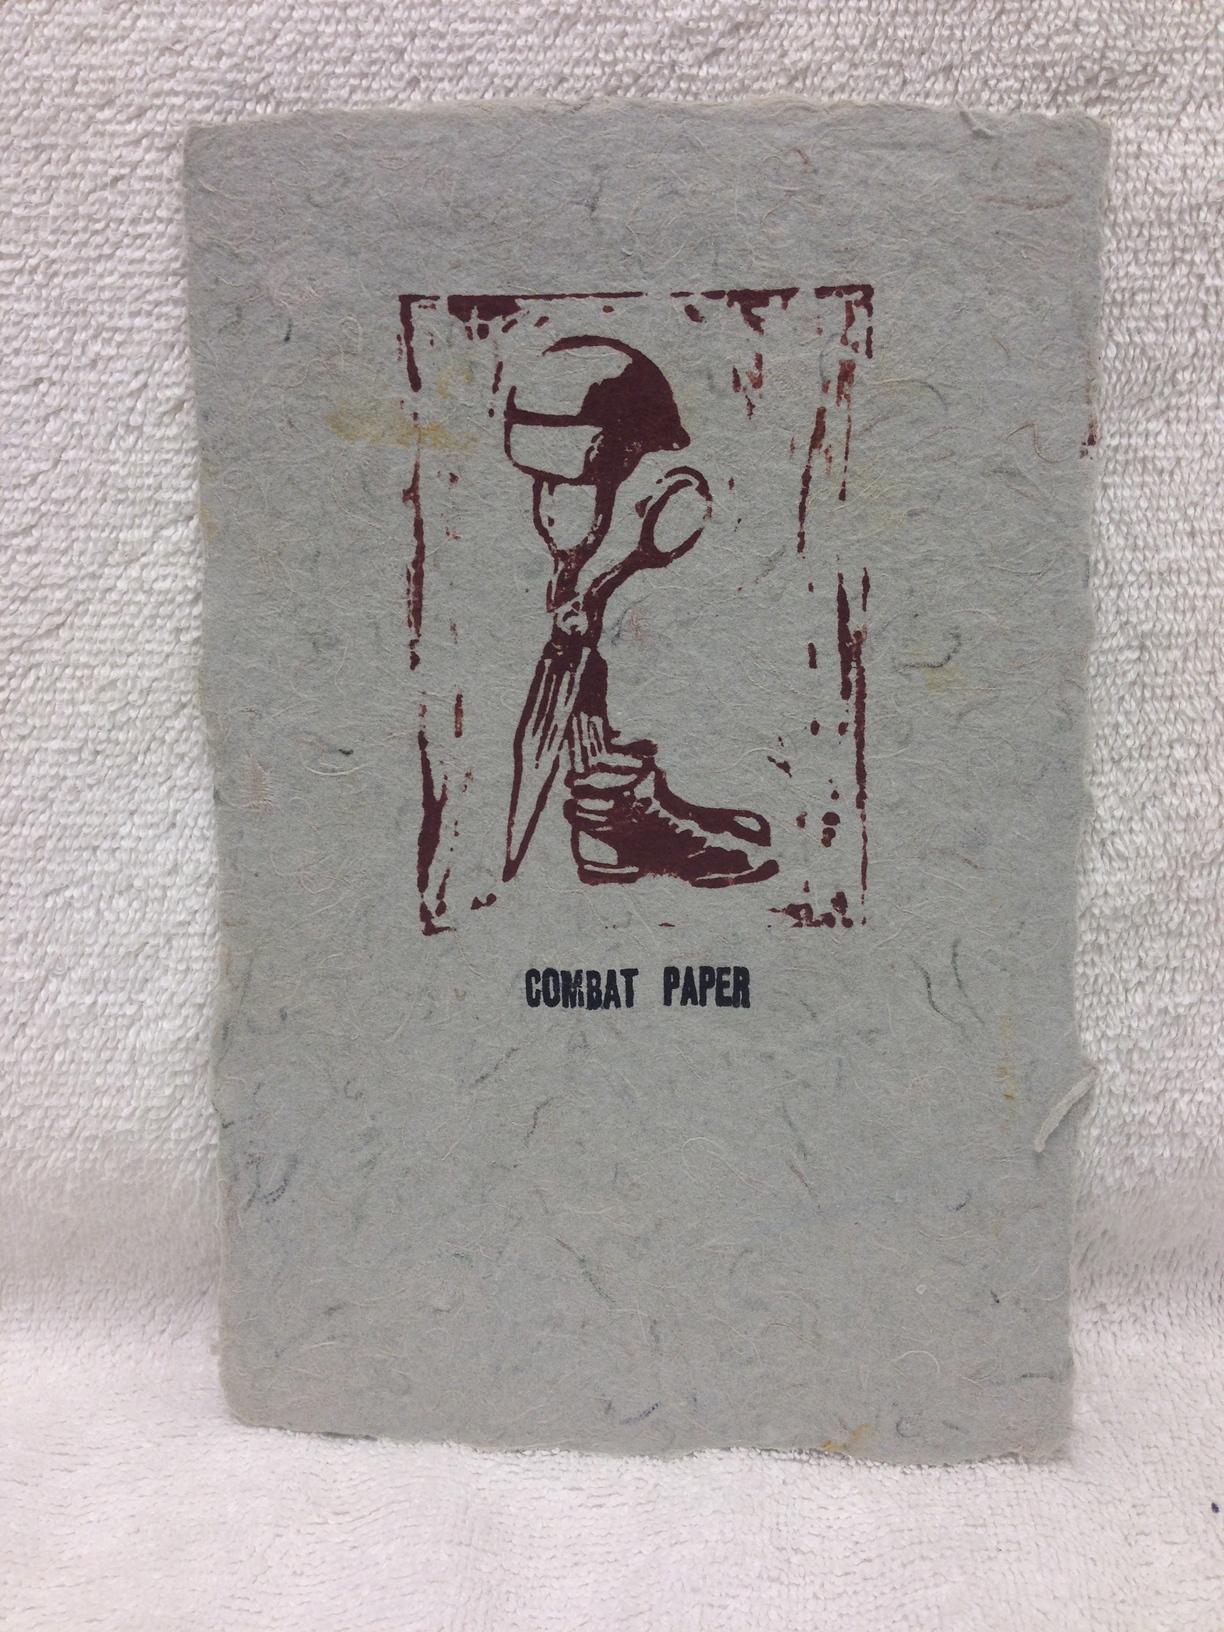 David Keefe Marines - Iraq _CPNJ Logo_ 2011 Lino-cut on Handmade Paper from military uniforms 8 x 5 PCNJ IMG_0952.jpg